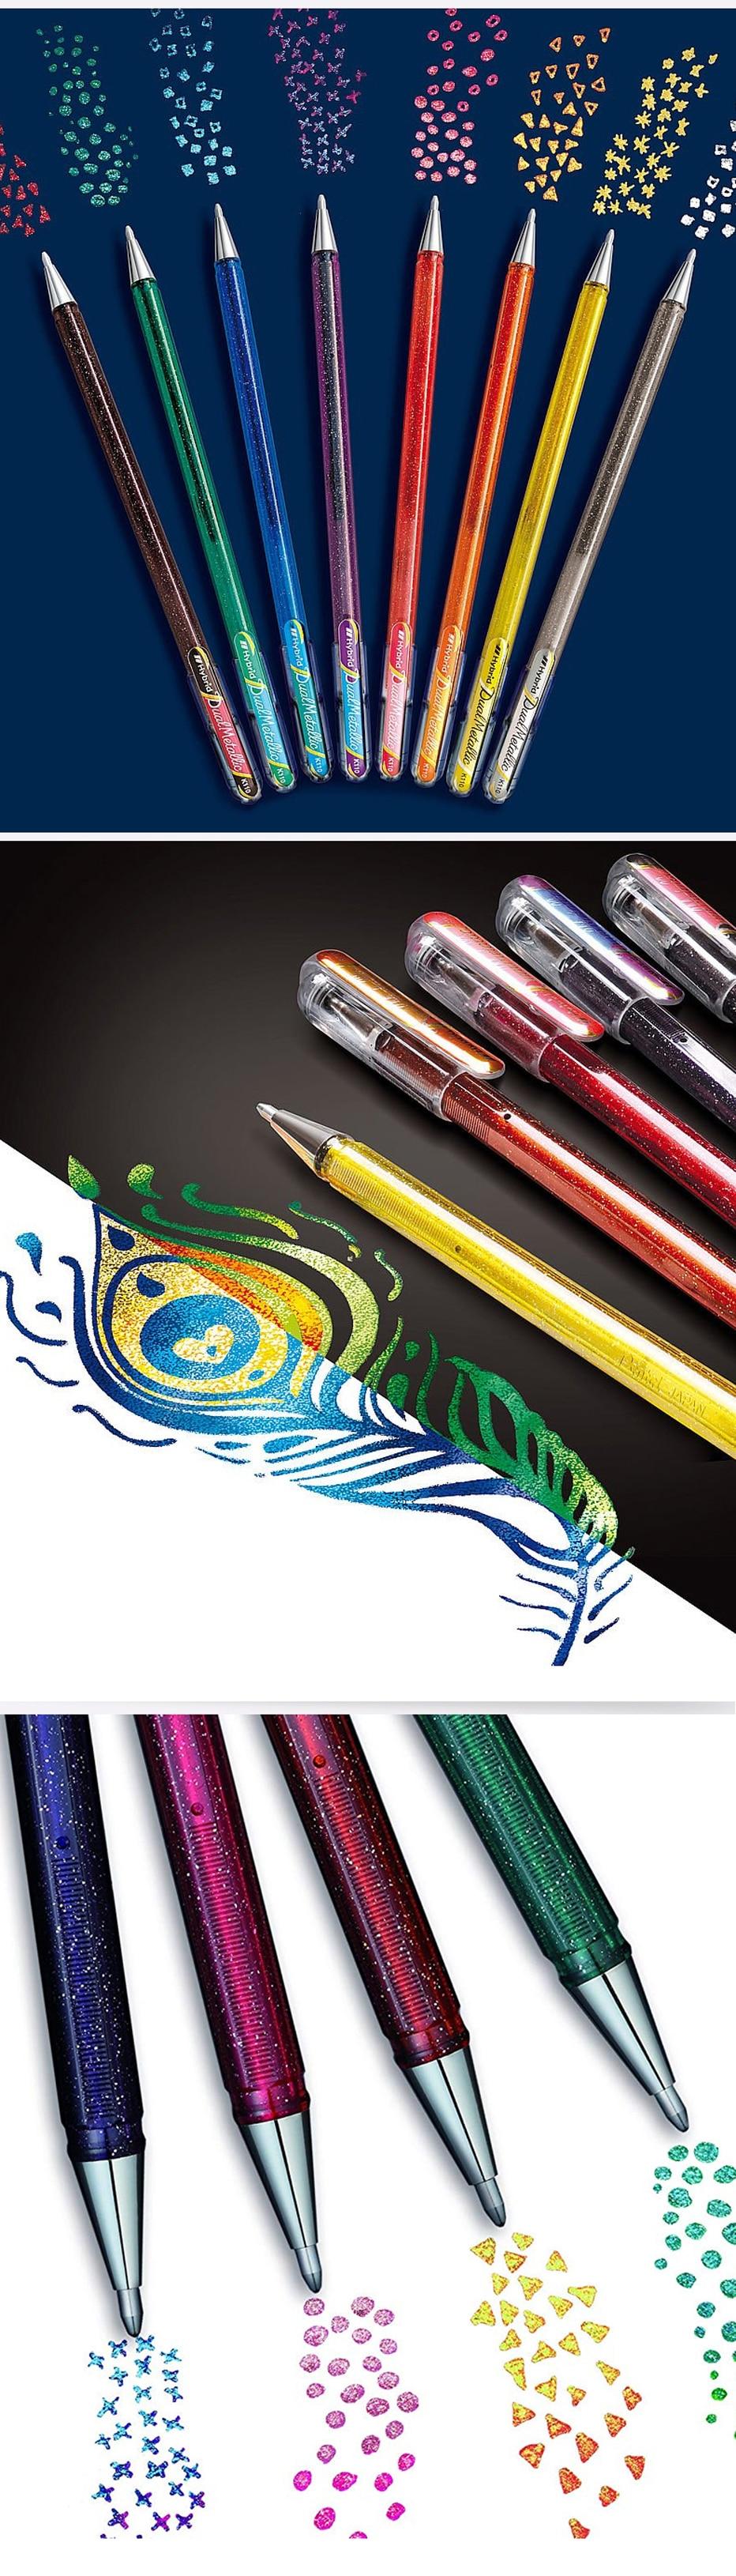 Pentel K110 bolígrafo de gel metálico híbrido de doble violeta + tinta azul Pluma de 4 X 1 2 Colores